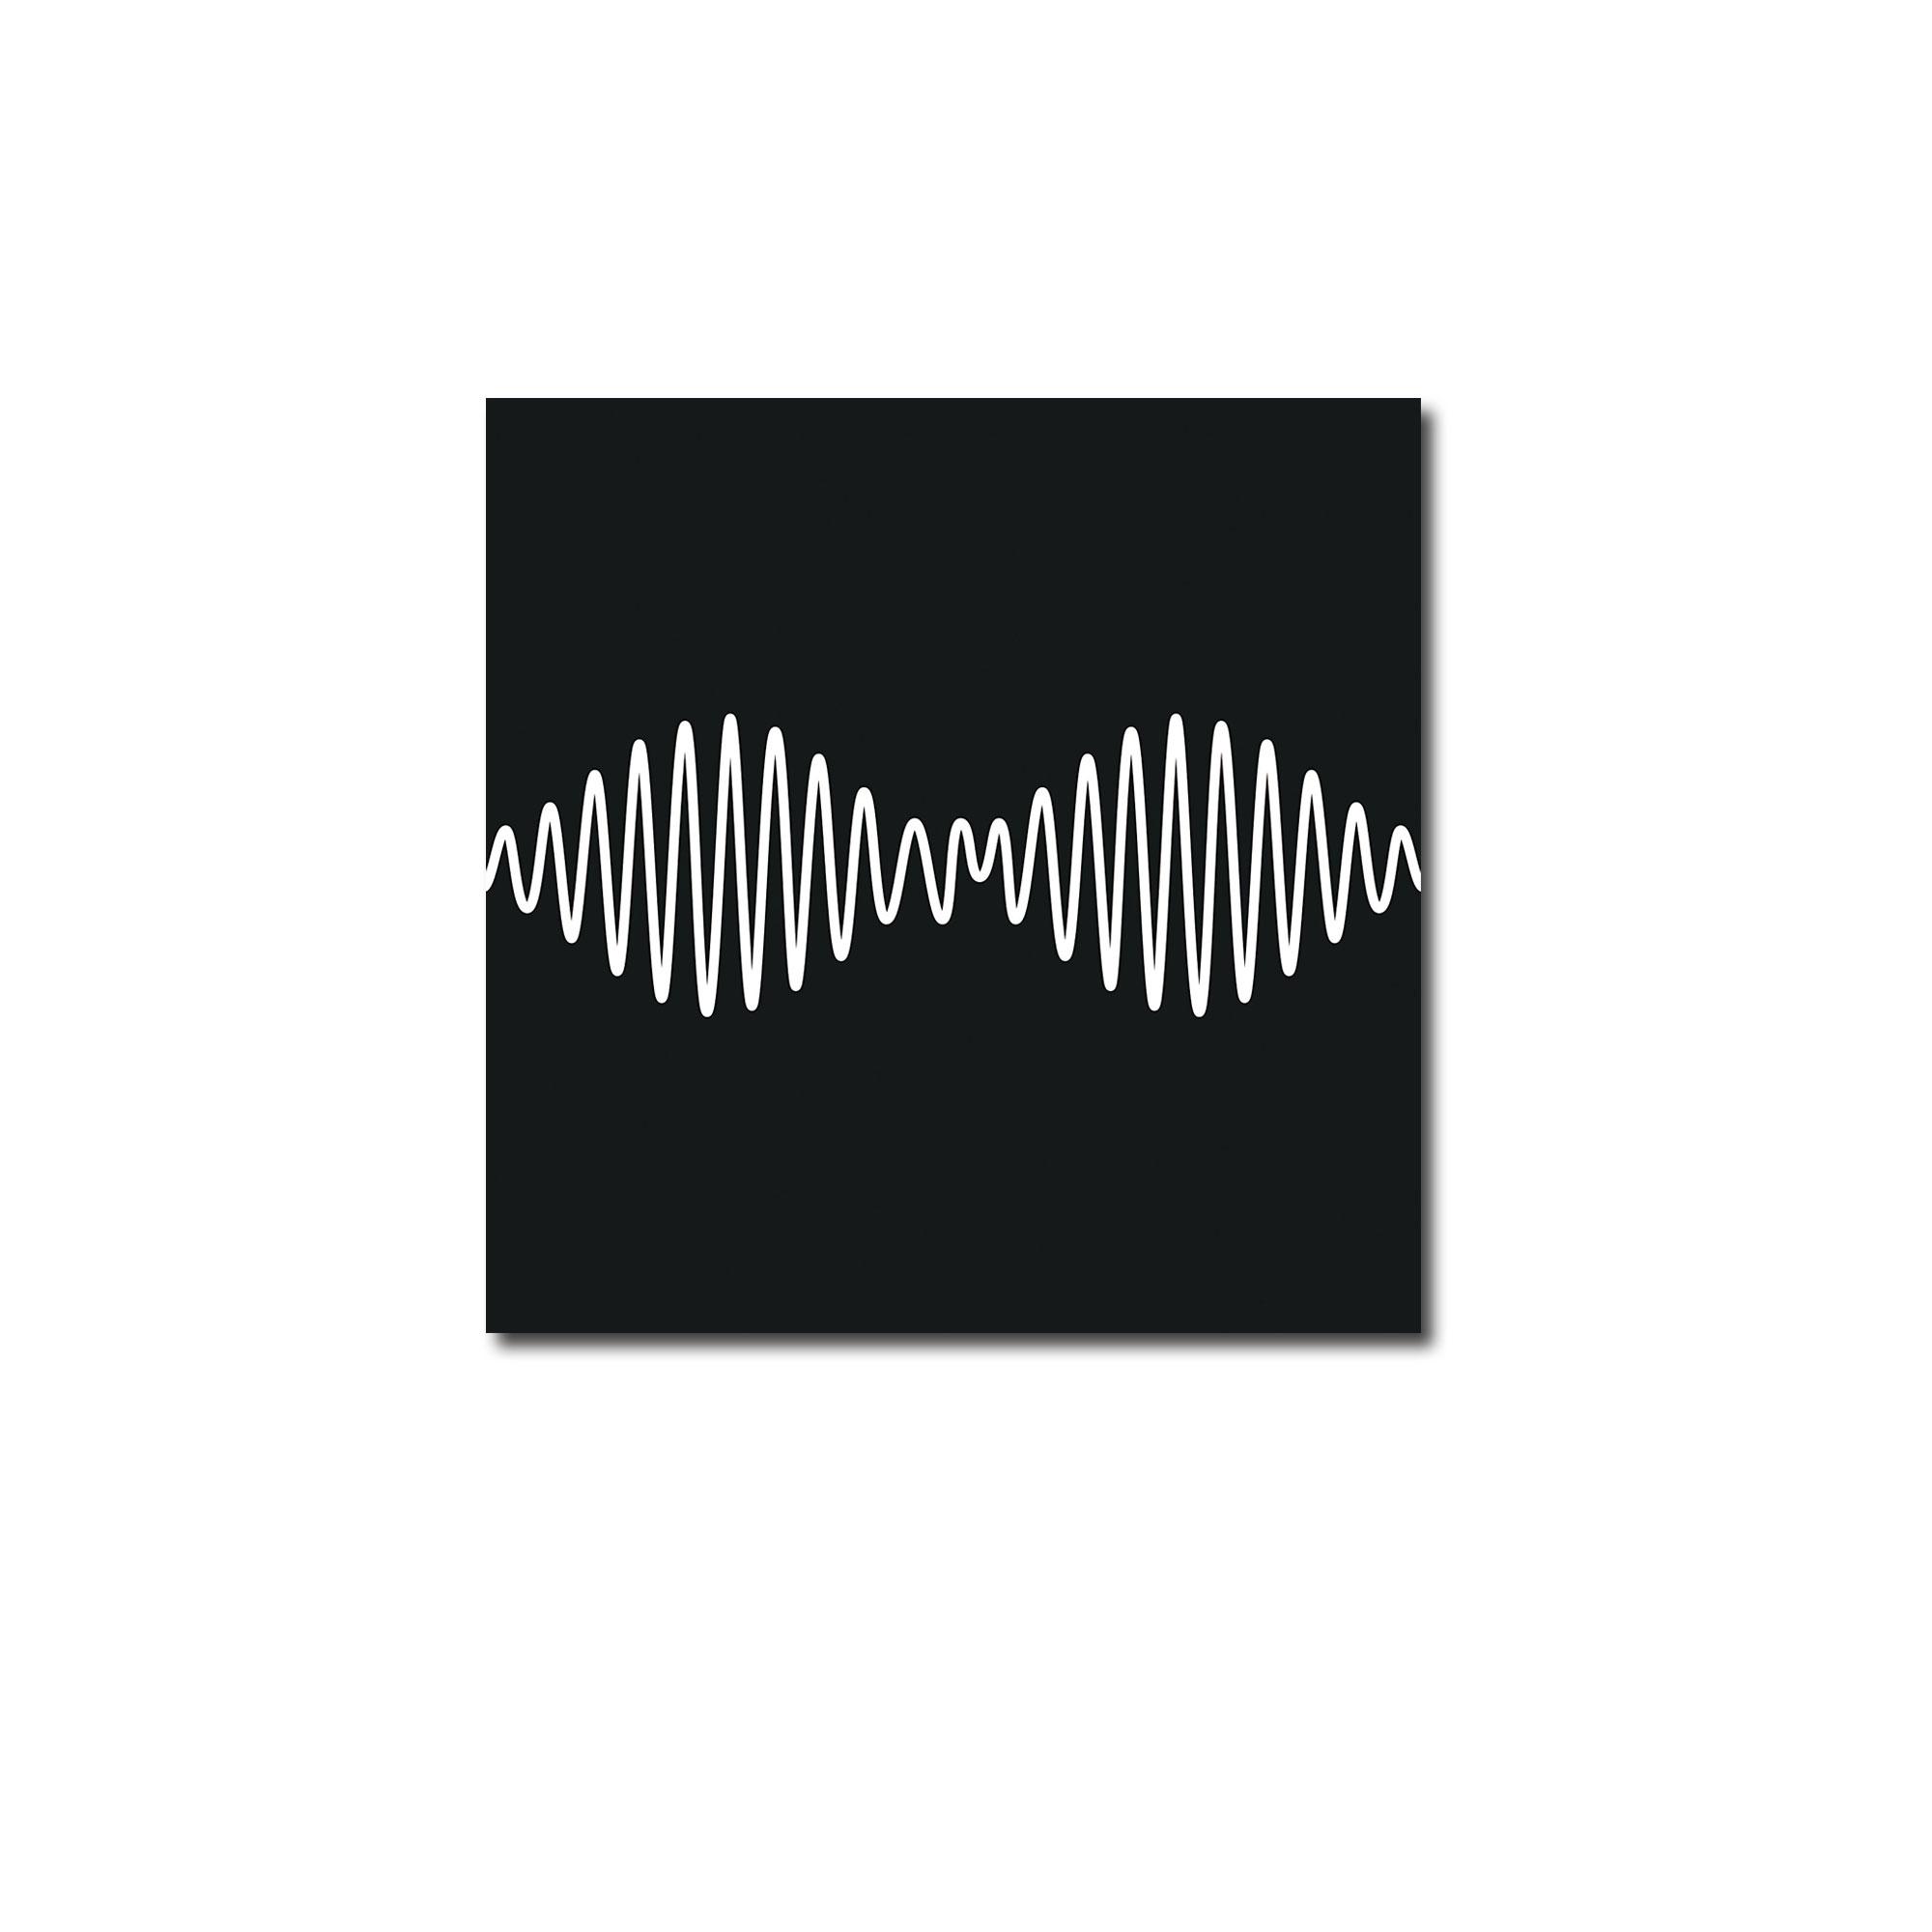 Arctic Monkeys AM artwork on white background